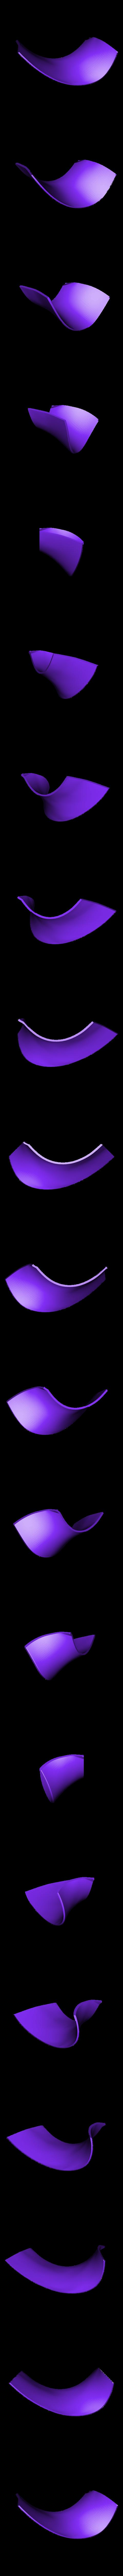 Part_17_v2.stl Download free STL file Senate Guard Helmet (Star Wars) • 3D printer design, VillainousPropShop